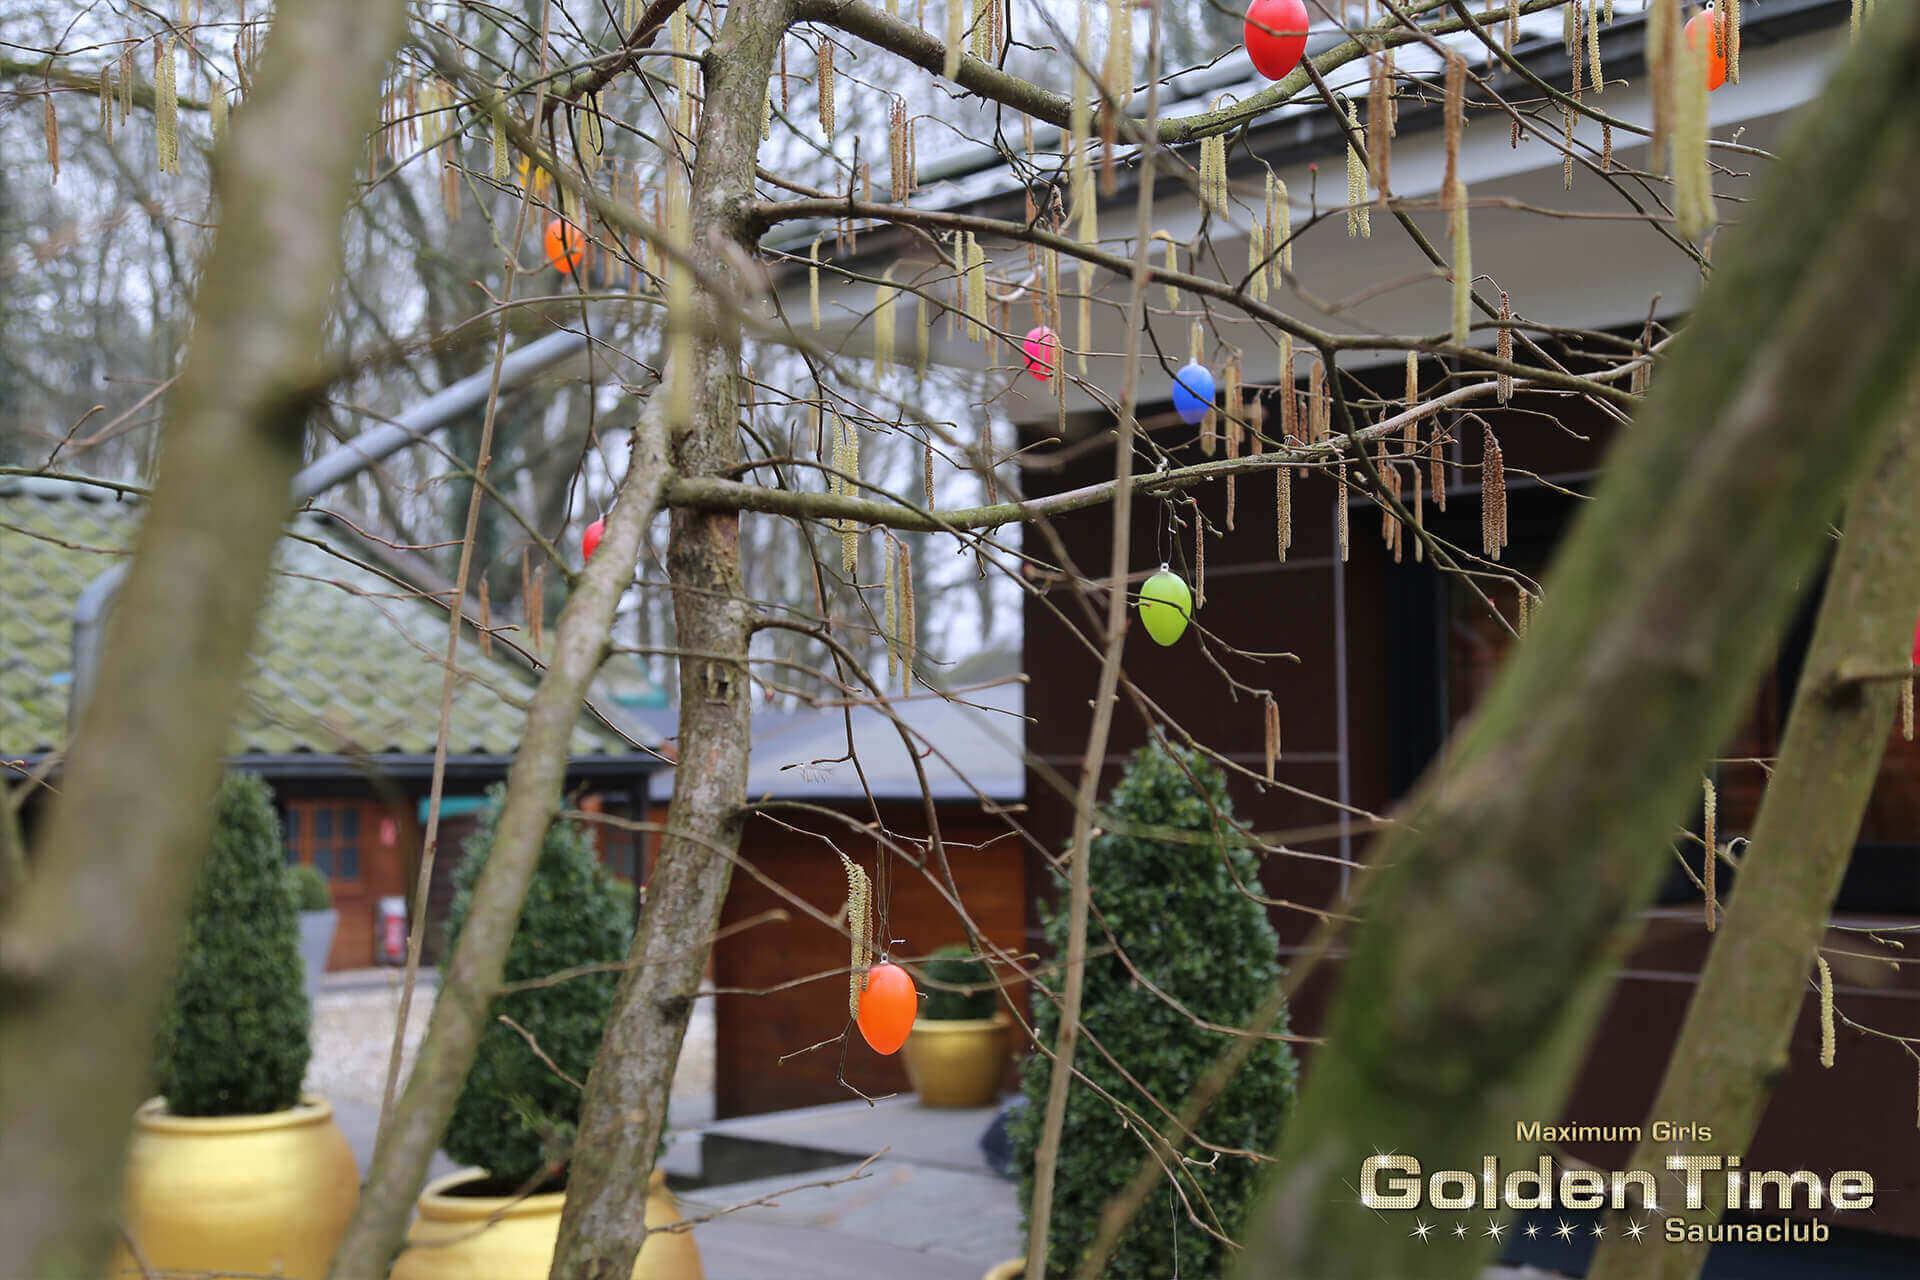 02-ostern-2016-pic-06-goldentime-saunaclub.jpg